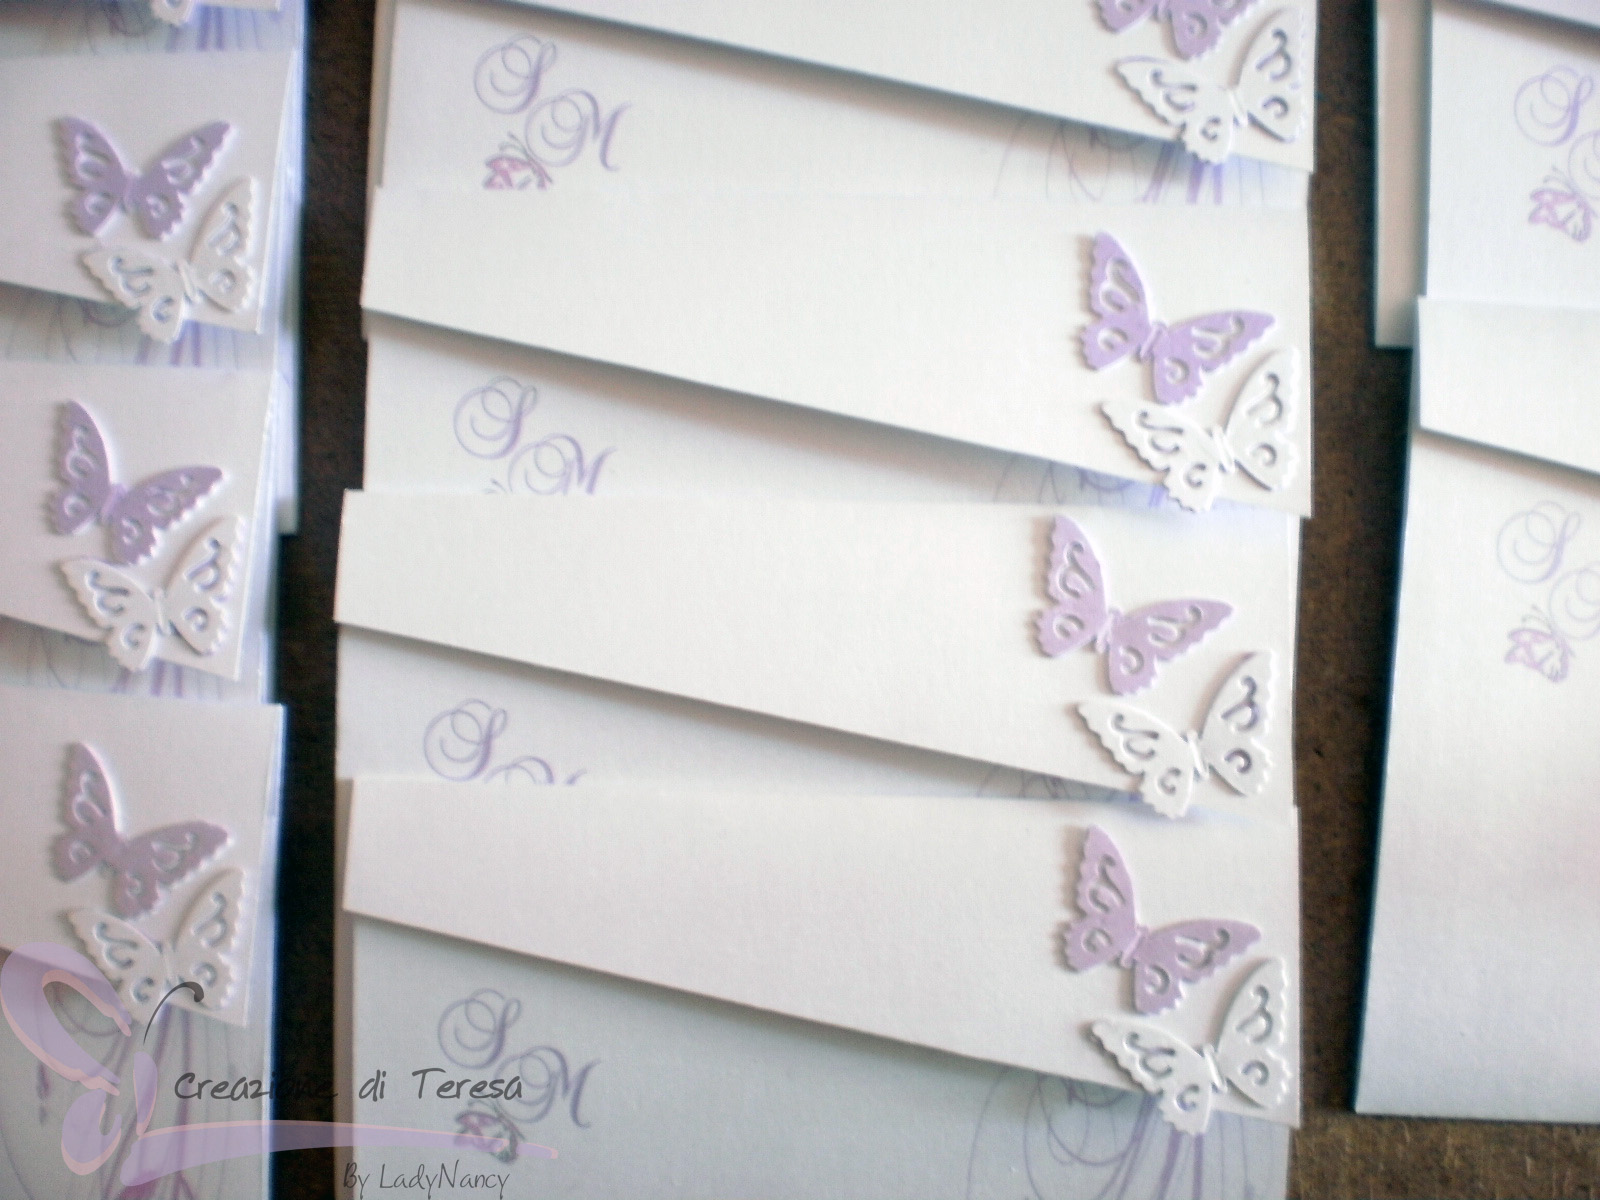 Favori Idee tema farfalle - Fai da te - Forum Matrimonio.com CQ81